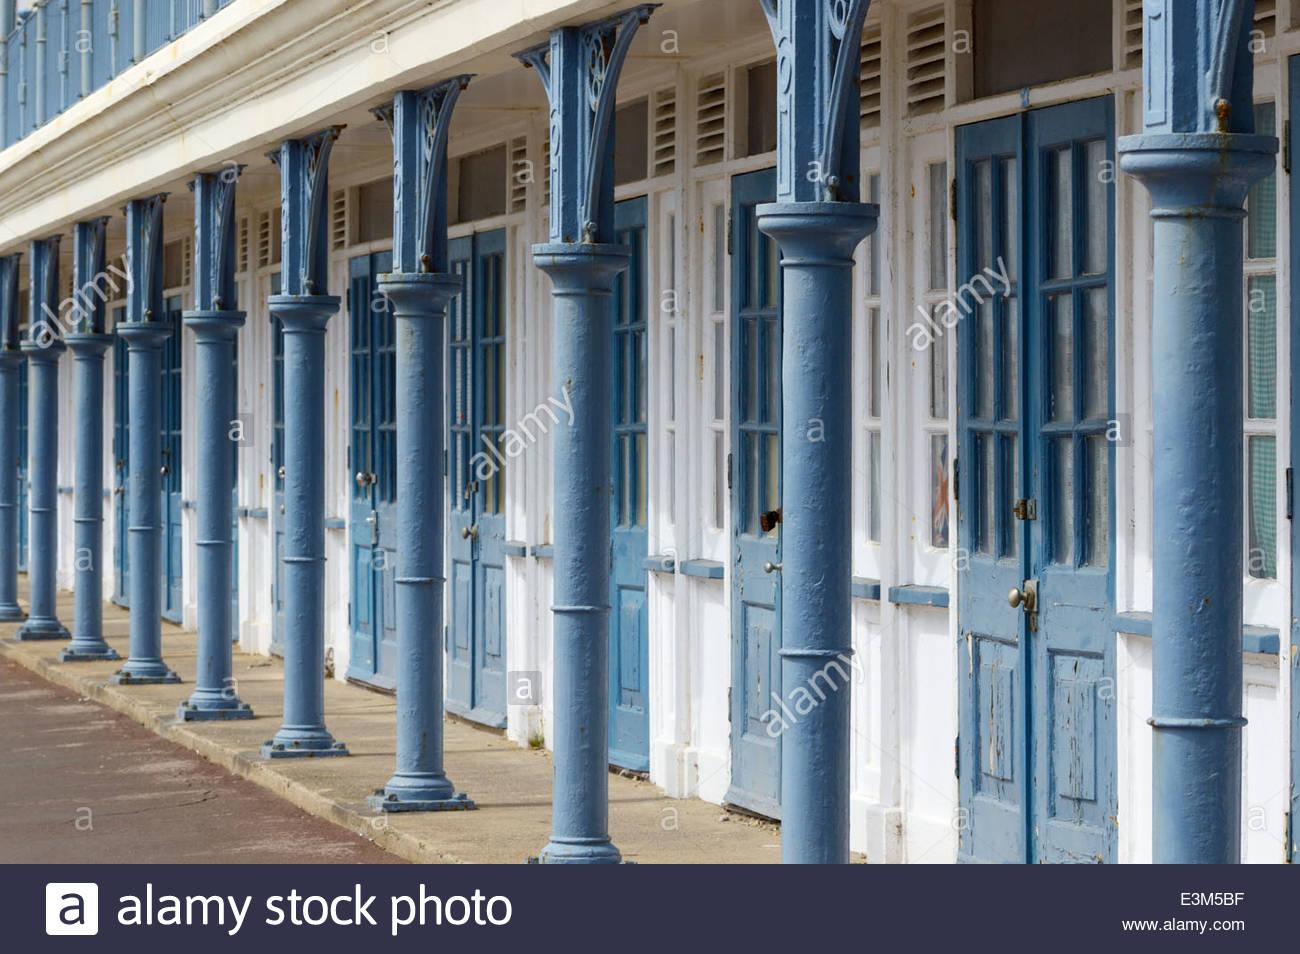 White Metal Pillars : View of the disrepairs metal pillars and doors